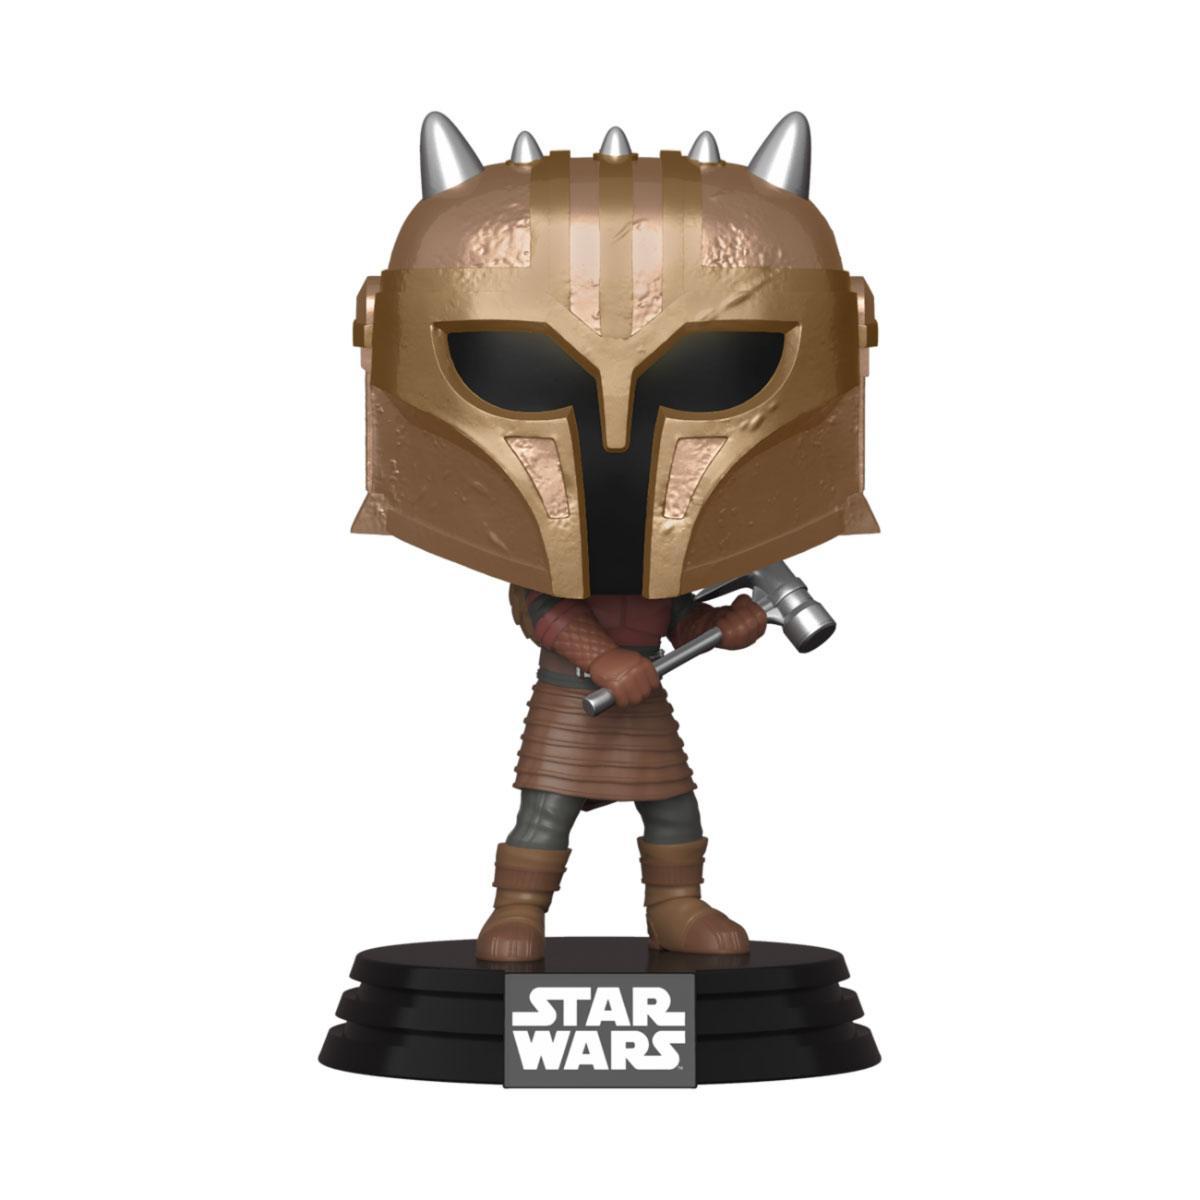 Star Wars The Mandalorian POP! TV Vinyl Figur The Armor 9 cm